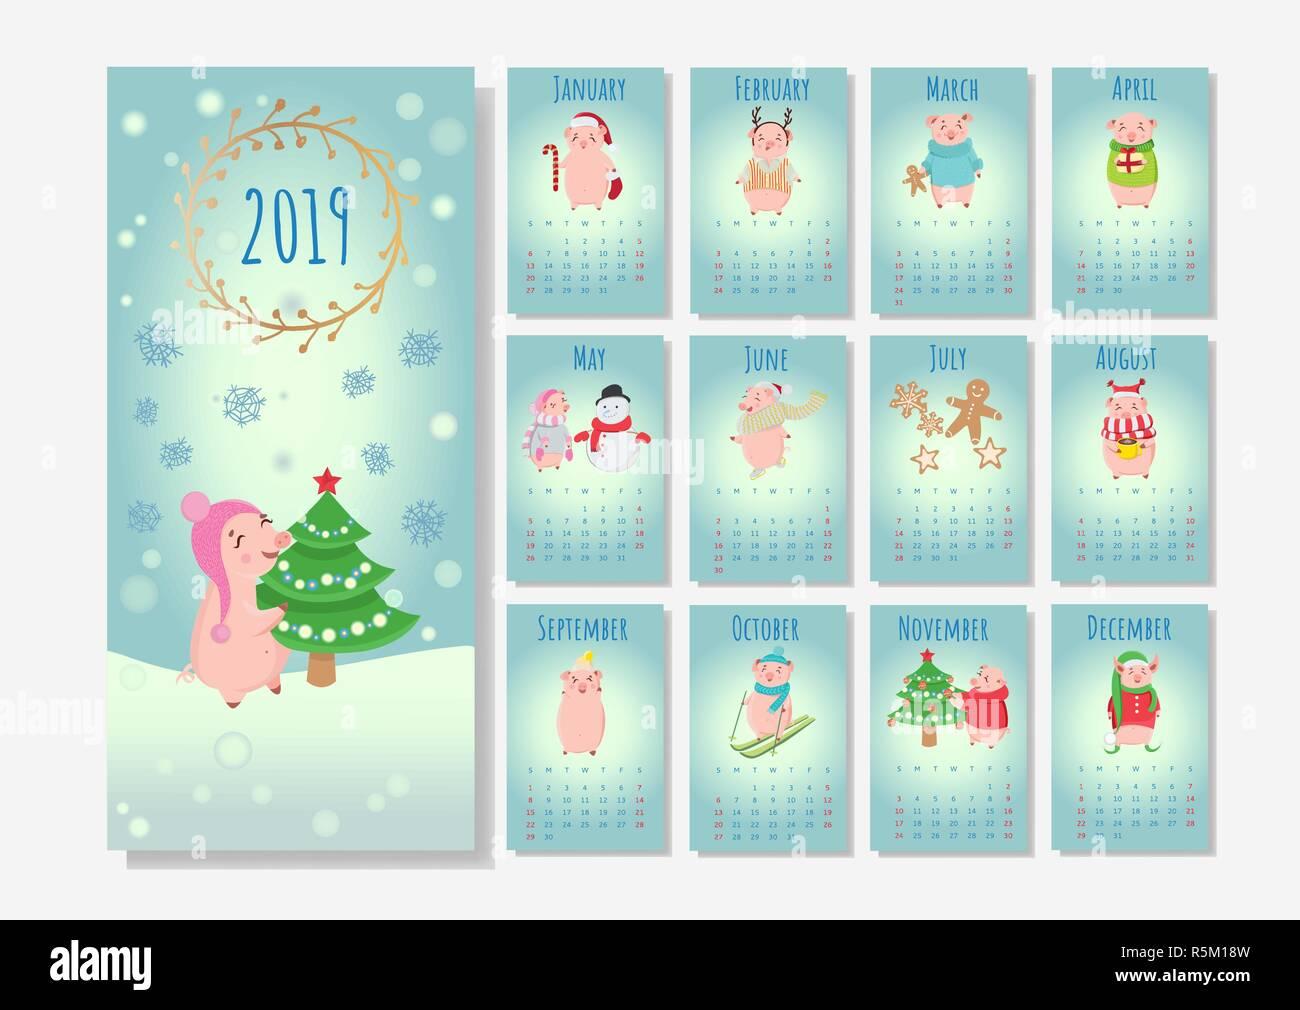 Christmas Holidays 2019 Calendar.Calendar With Christmas Holiday Piglets 2019 Winter